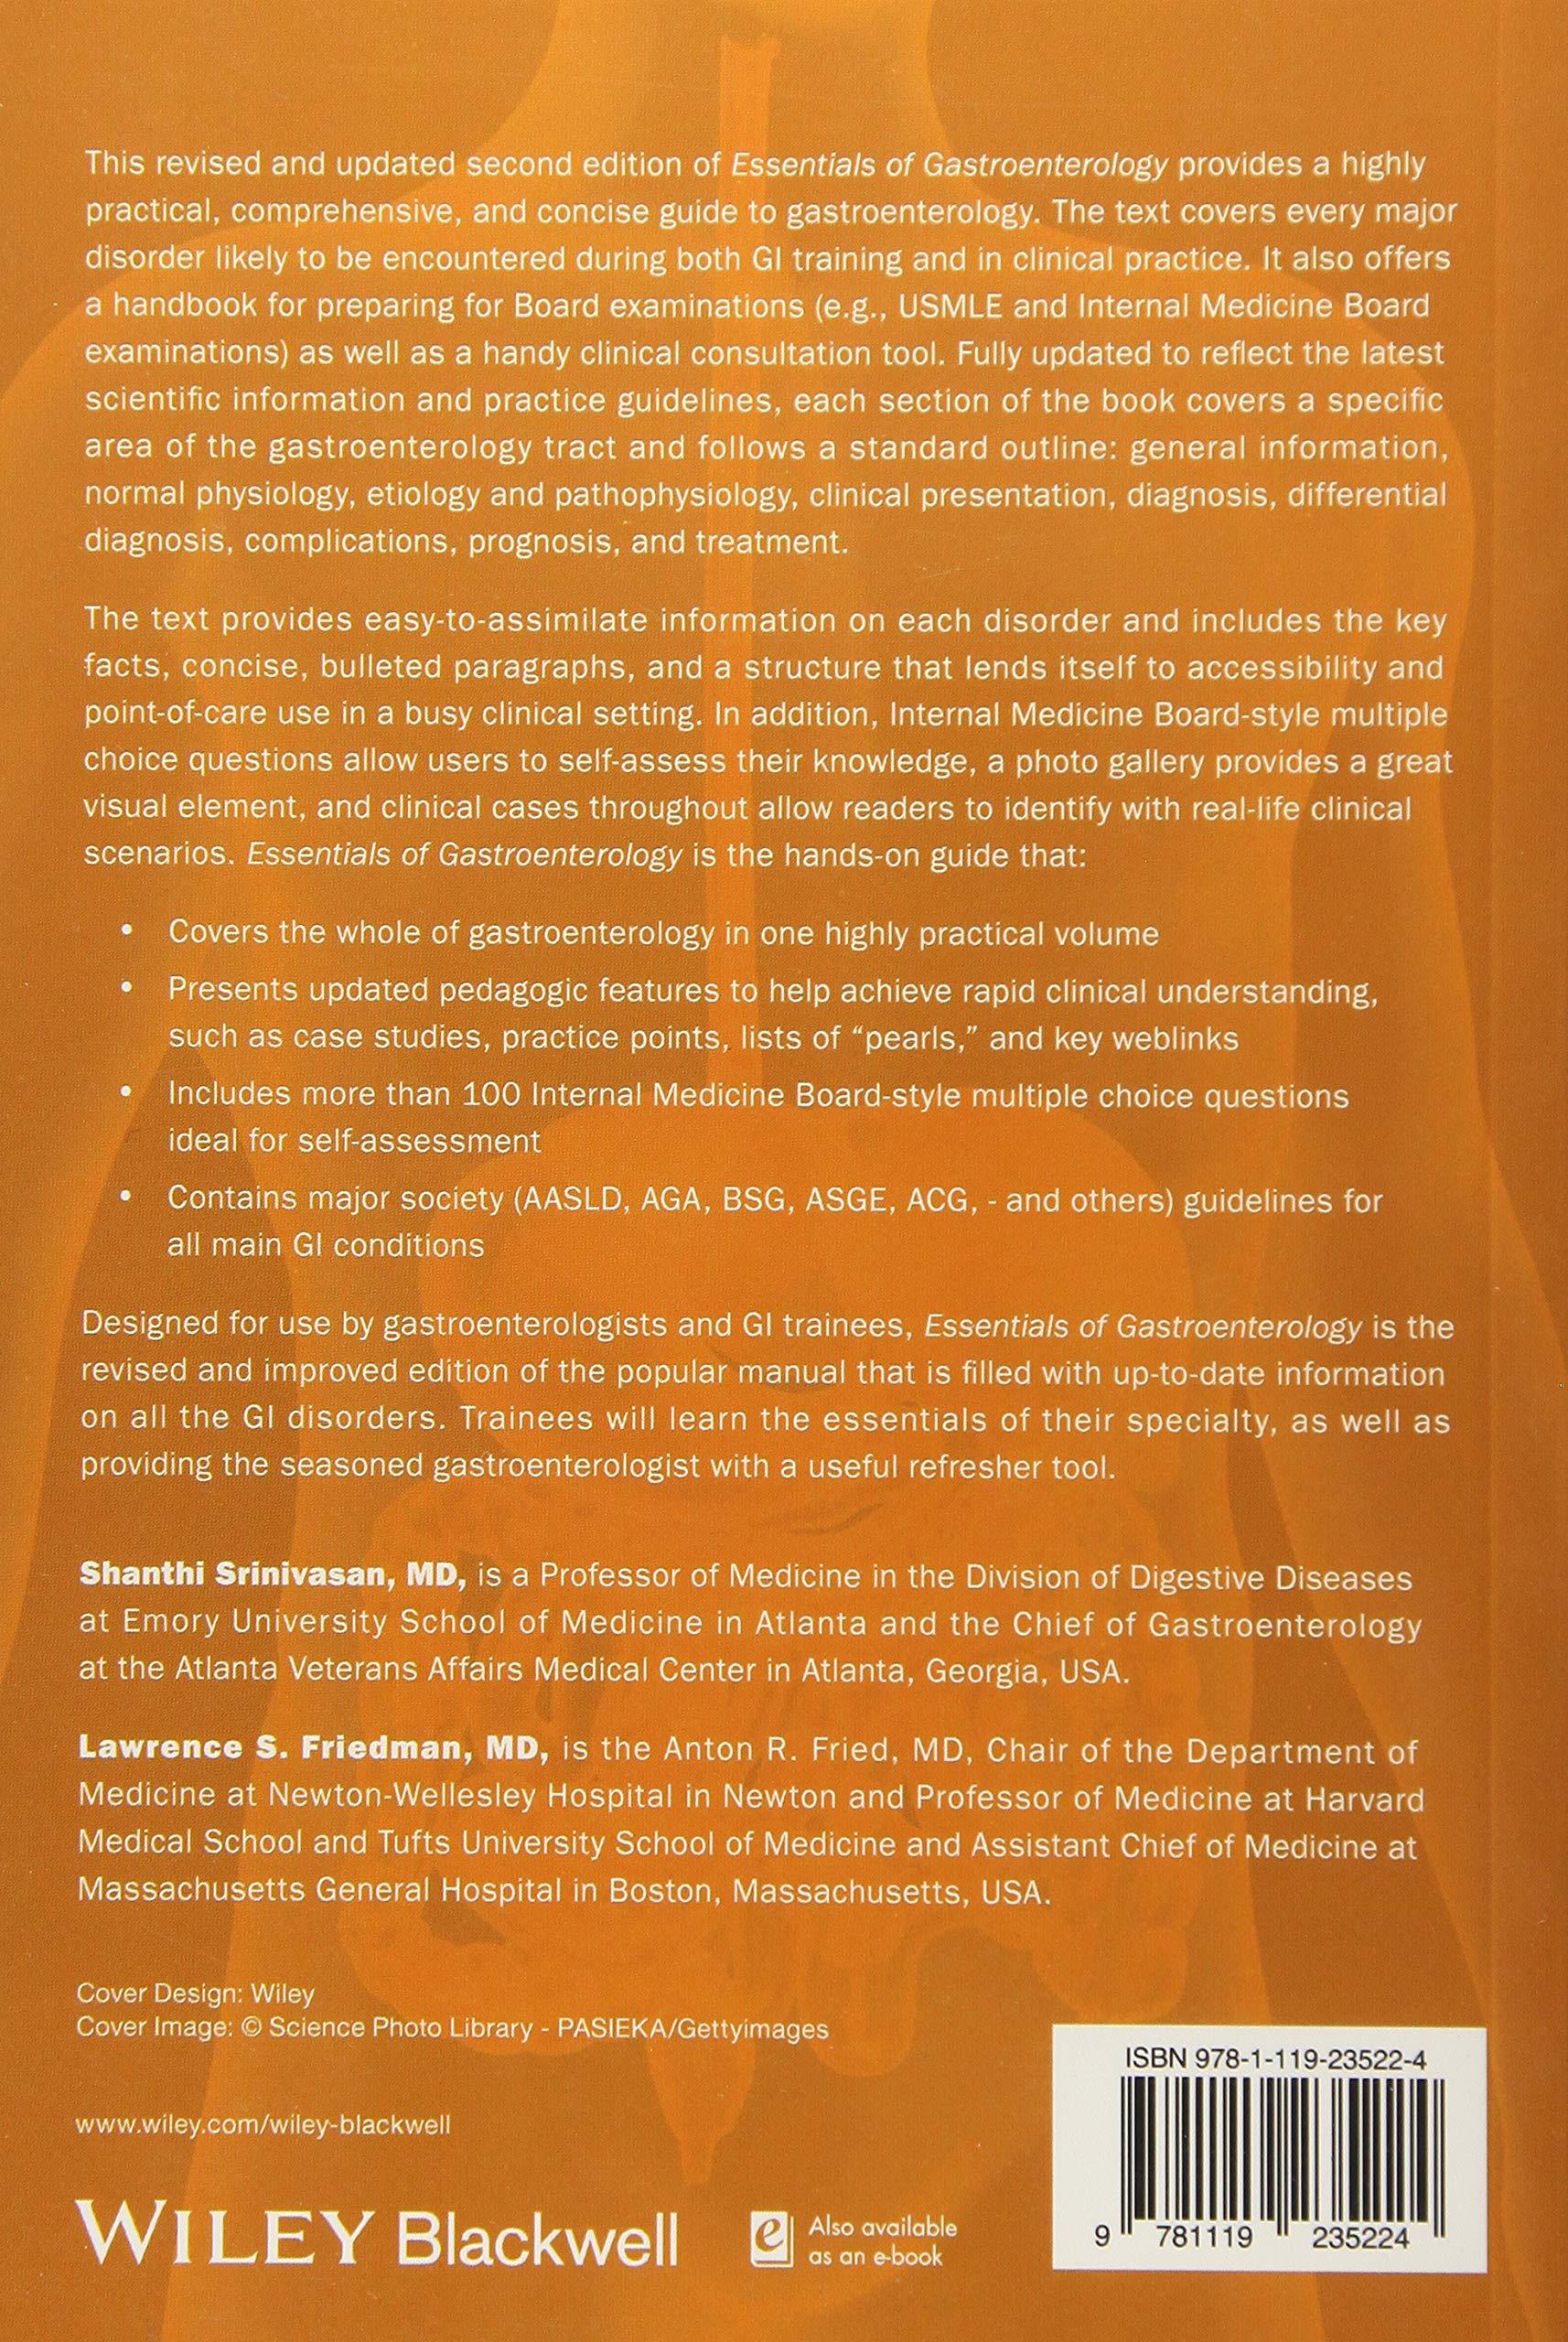 Buy Sitaraman and Friedman′s Essentials of Gastroenterology Book